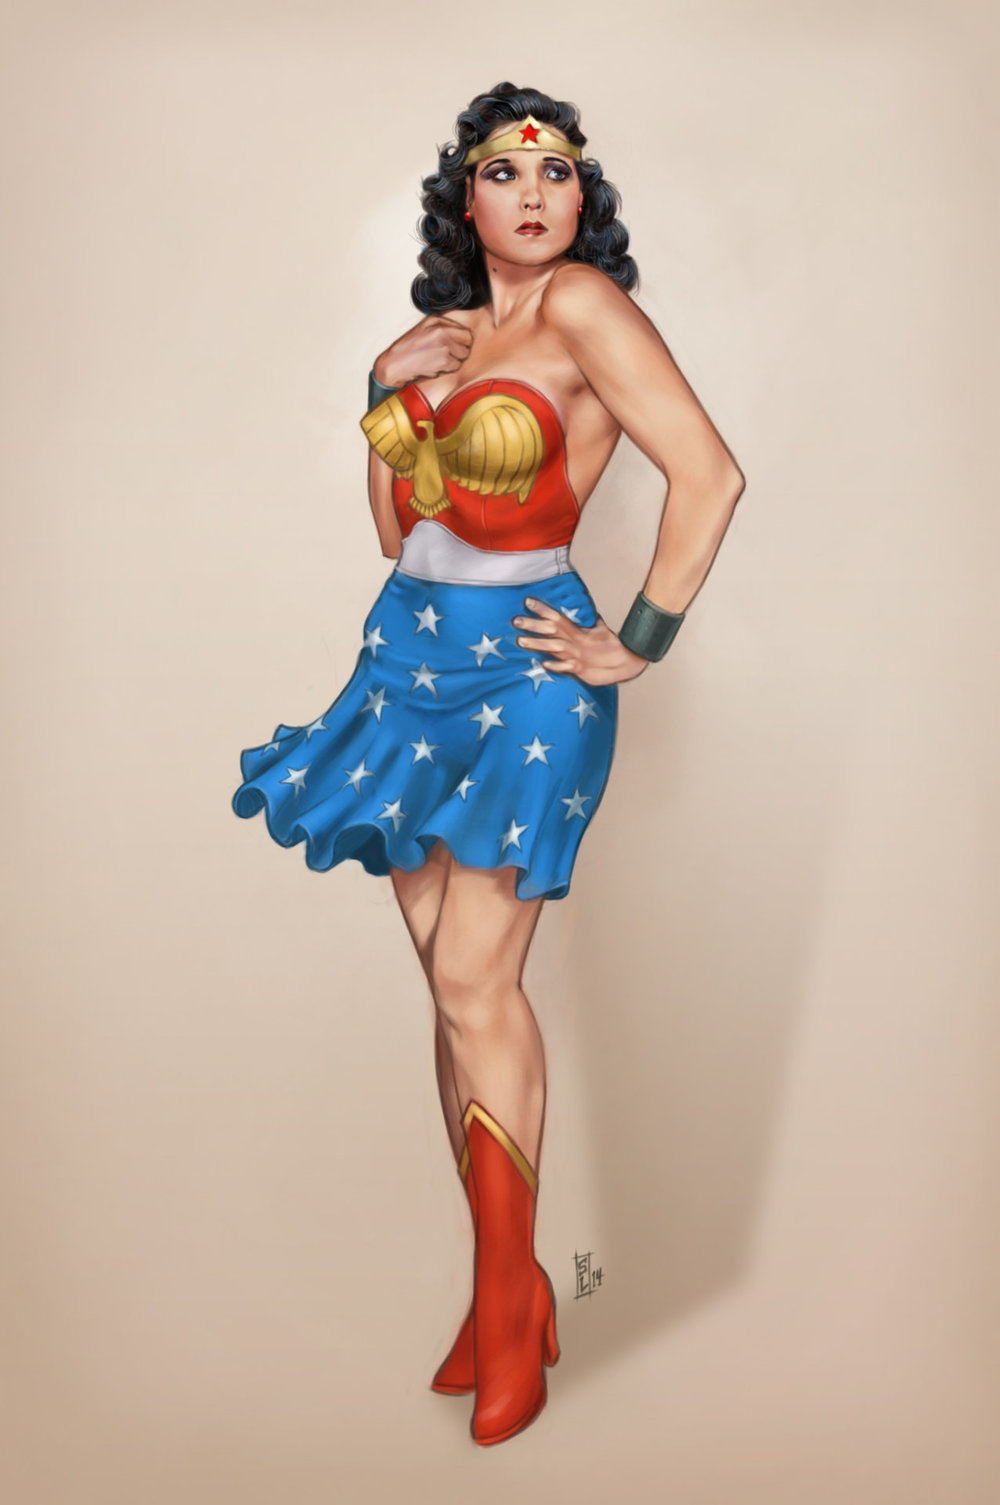 Classy female superhero pin up art by stephen langmead geektyrant - Photo pin up ...